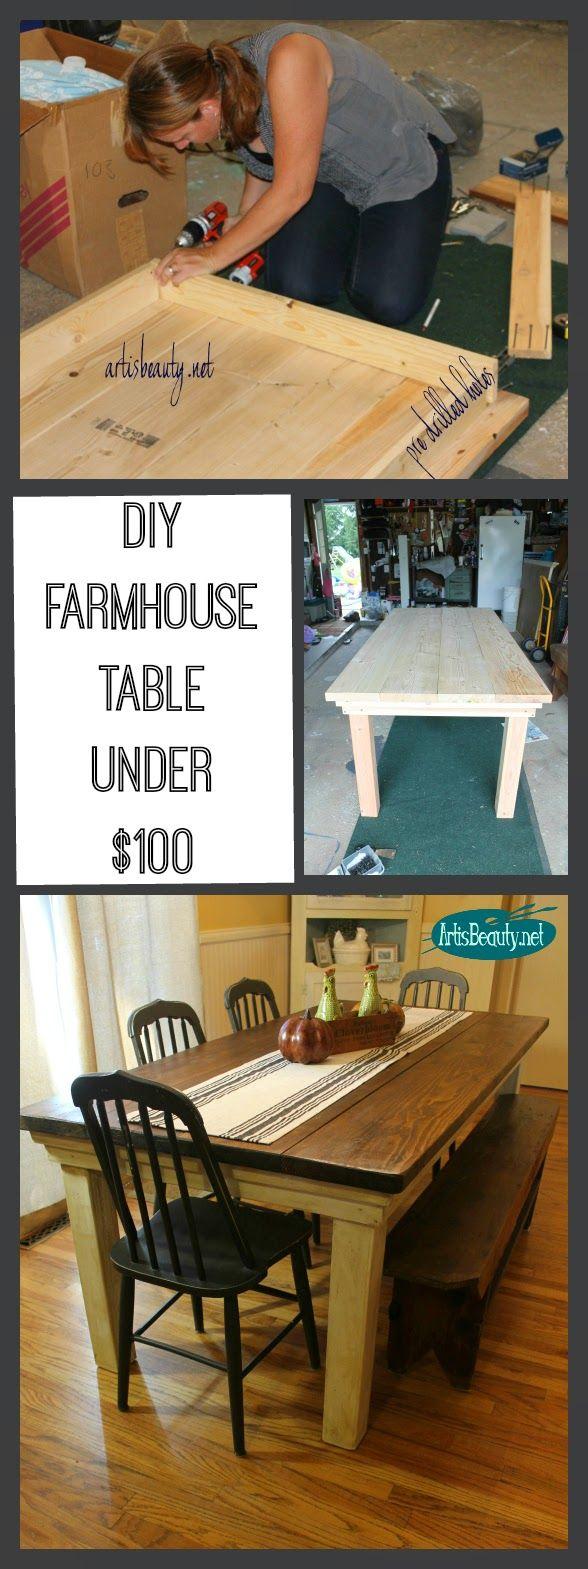 Best 25+ Farmhouse dining tables ideas on Pinterest | Wood ...